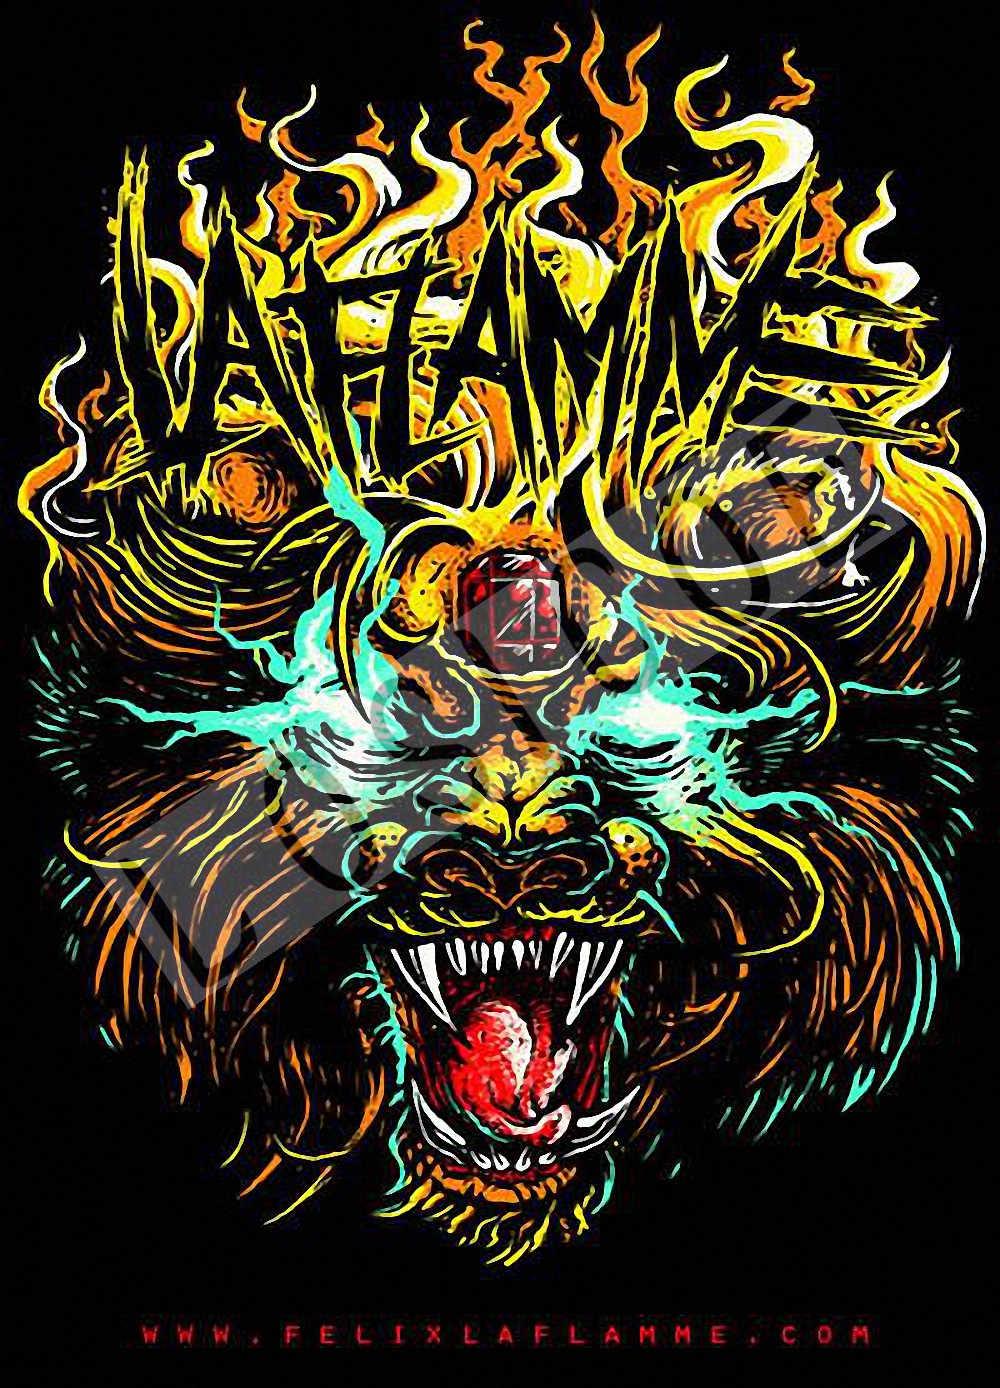 Halloween Poster Art.Tattoo Heavy Metal Rock Band Posters Wall Sticker 30x42 Cm Nostalgia Retro Kraft Paper Hd Inkjet Printing Art Halloween Decor D